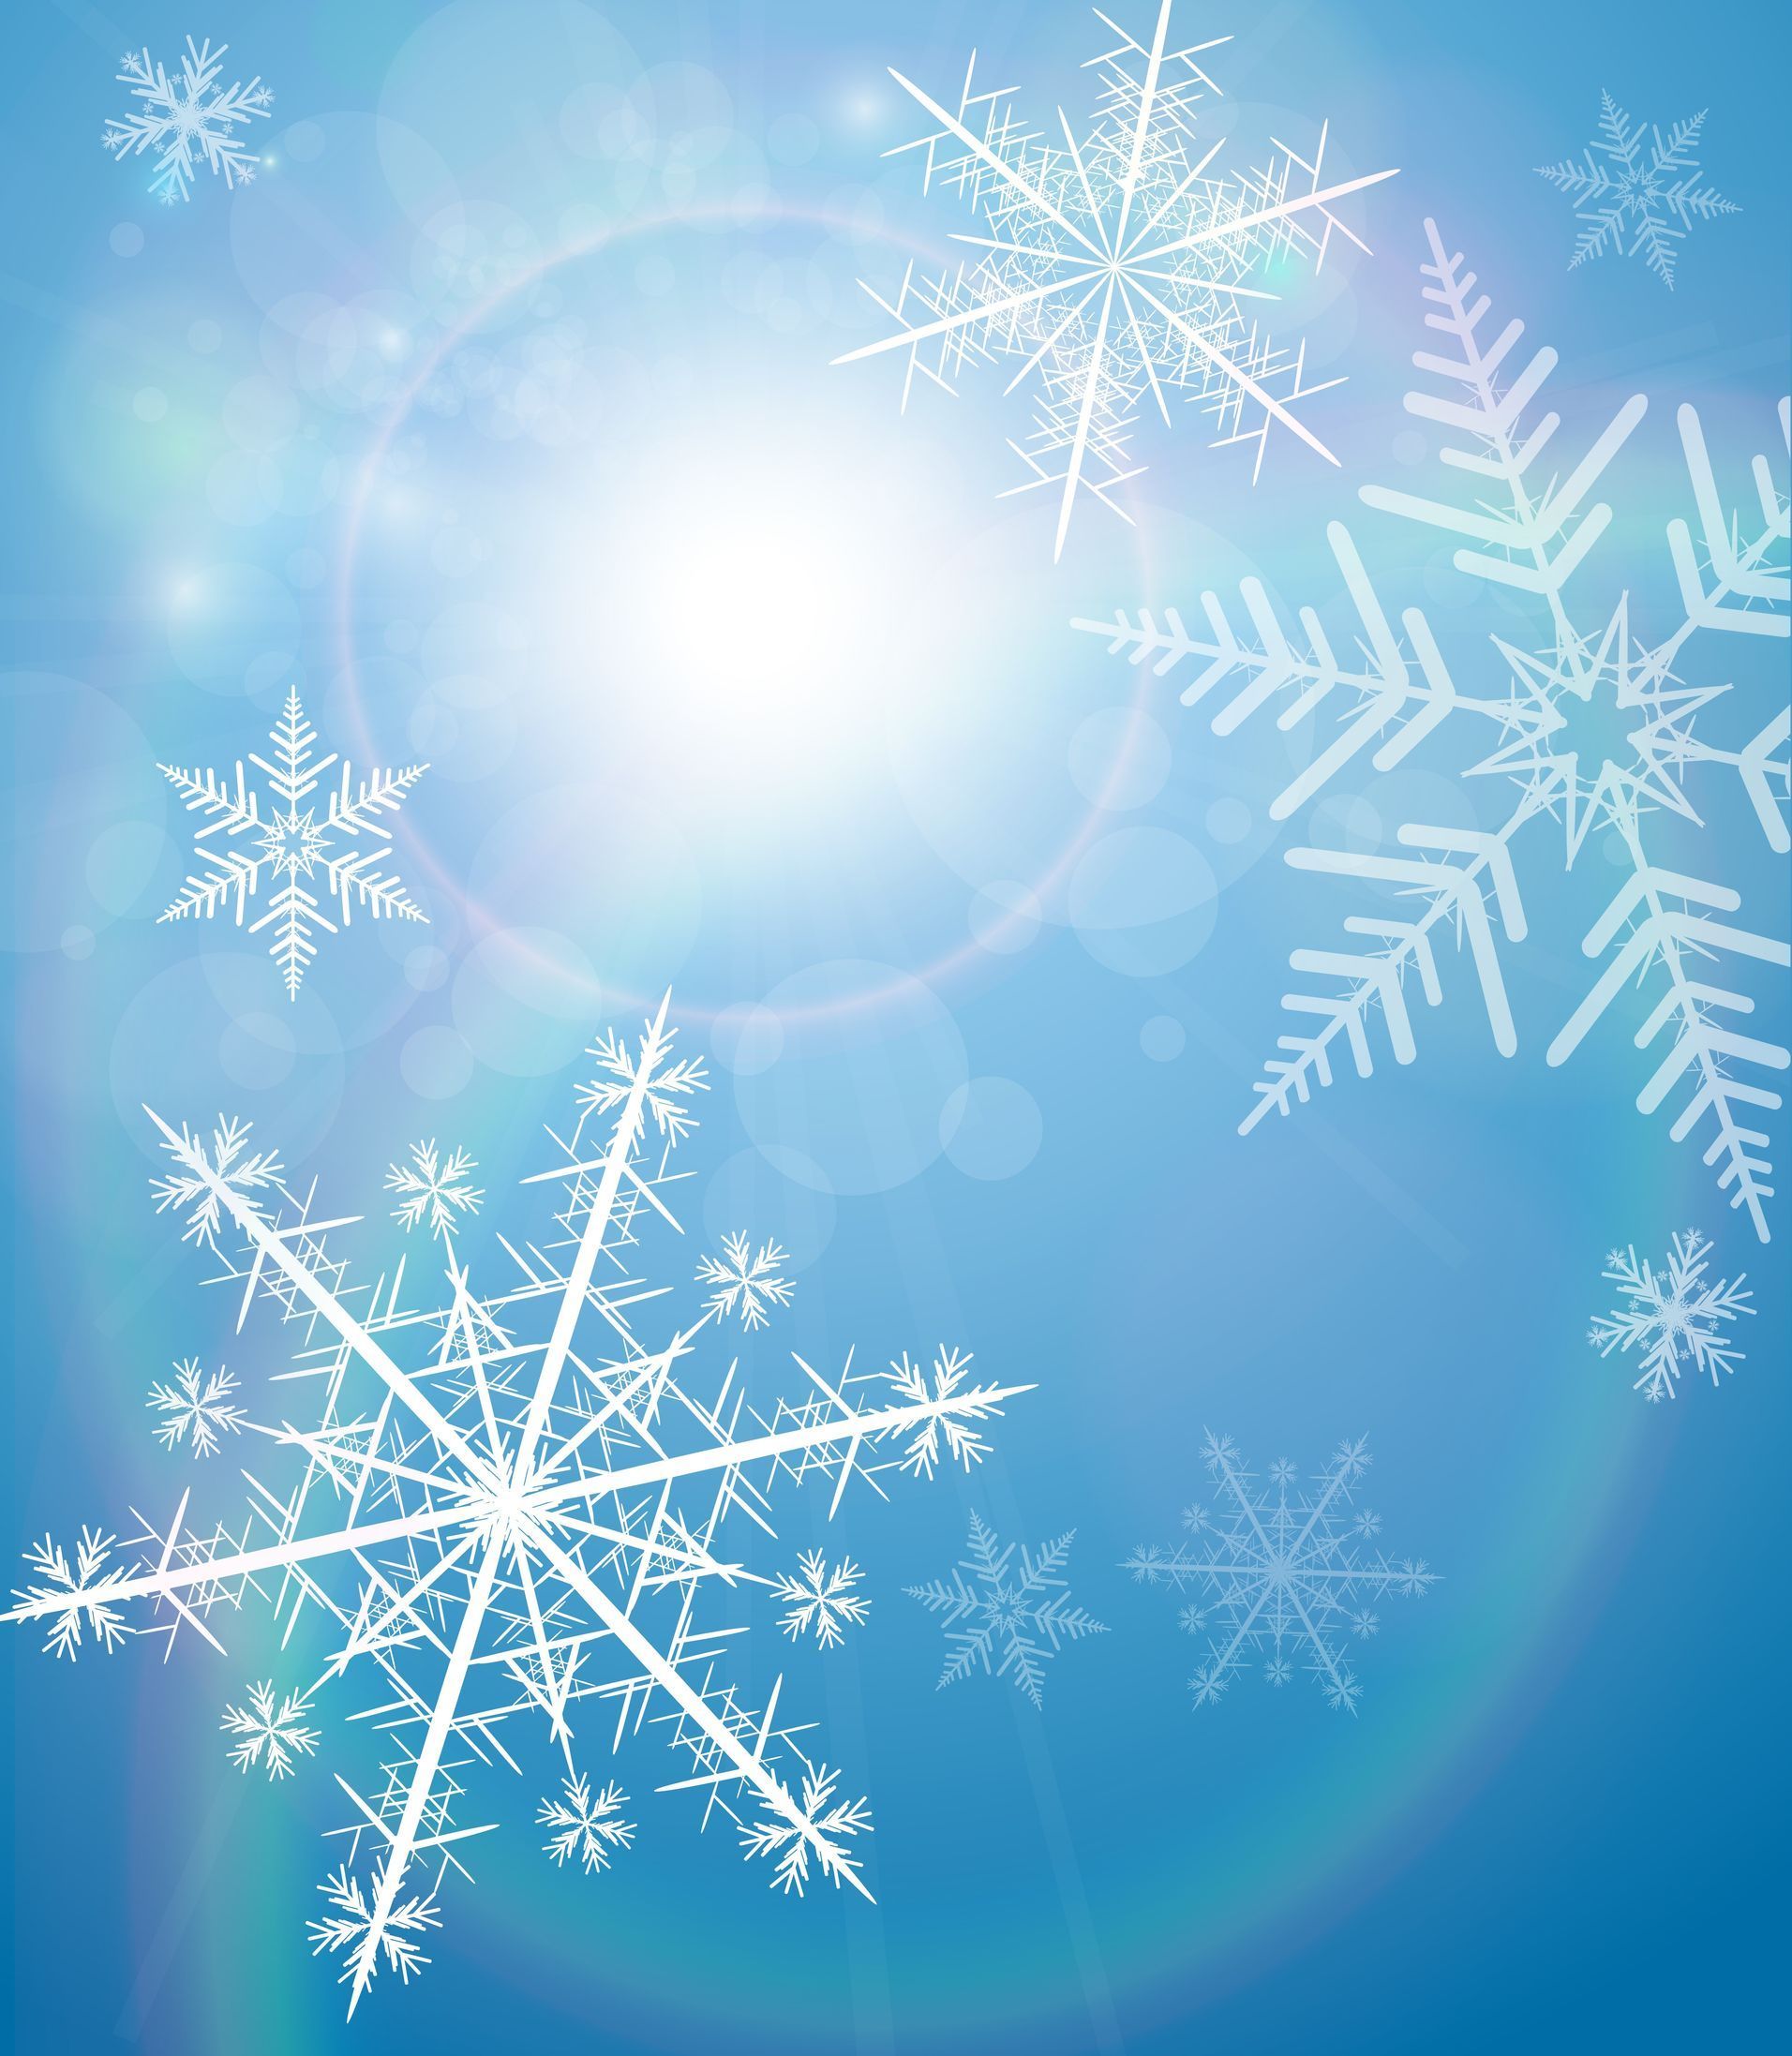 60 BEAUTIFUL NATURE WALLPAPER FREE TO DOWNLOAD. Winter